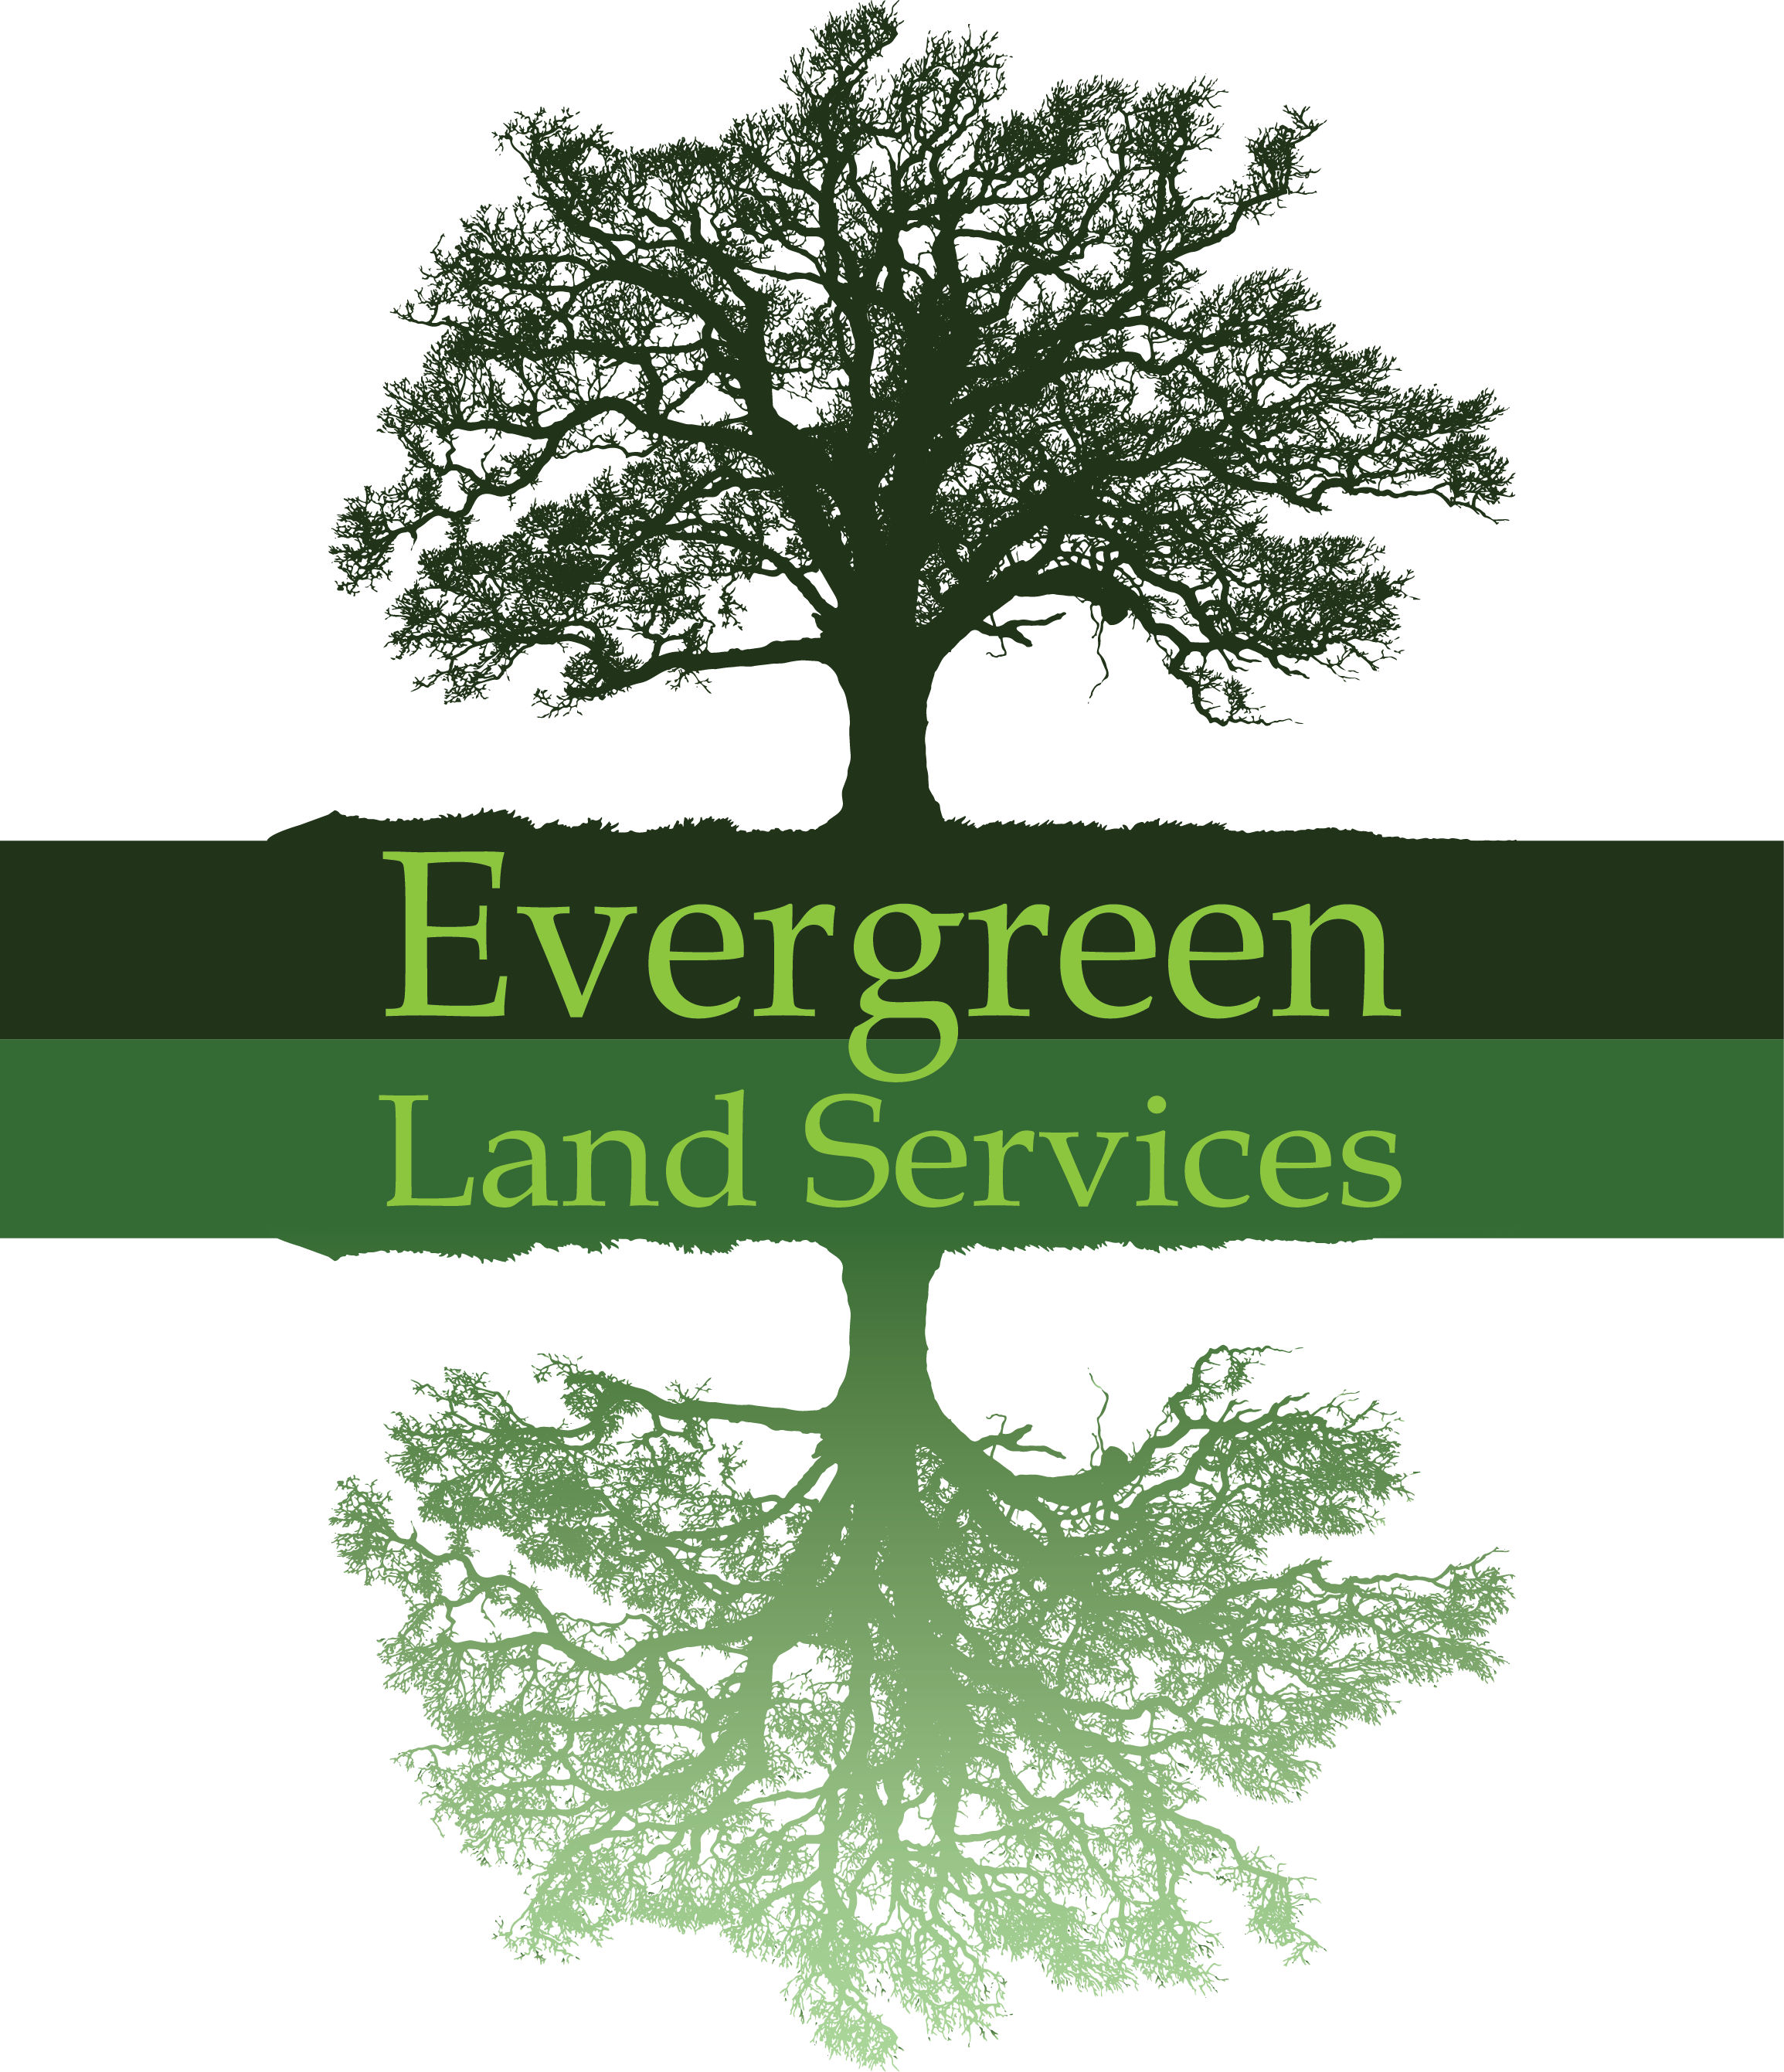 Evergreen Land Services logo